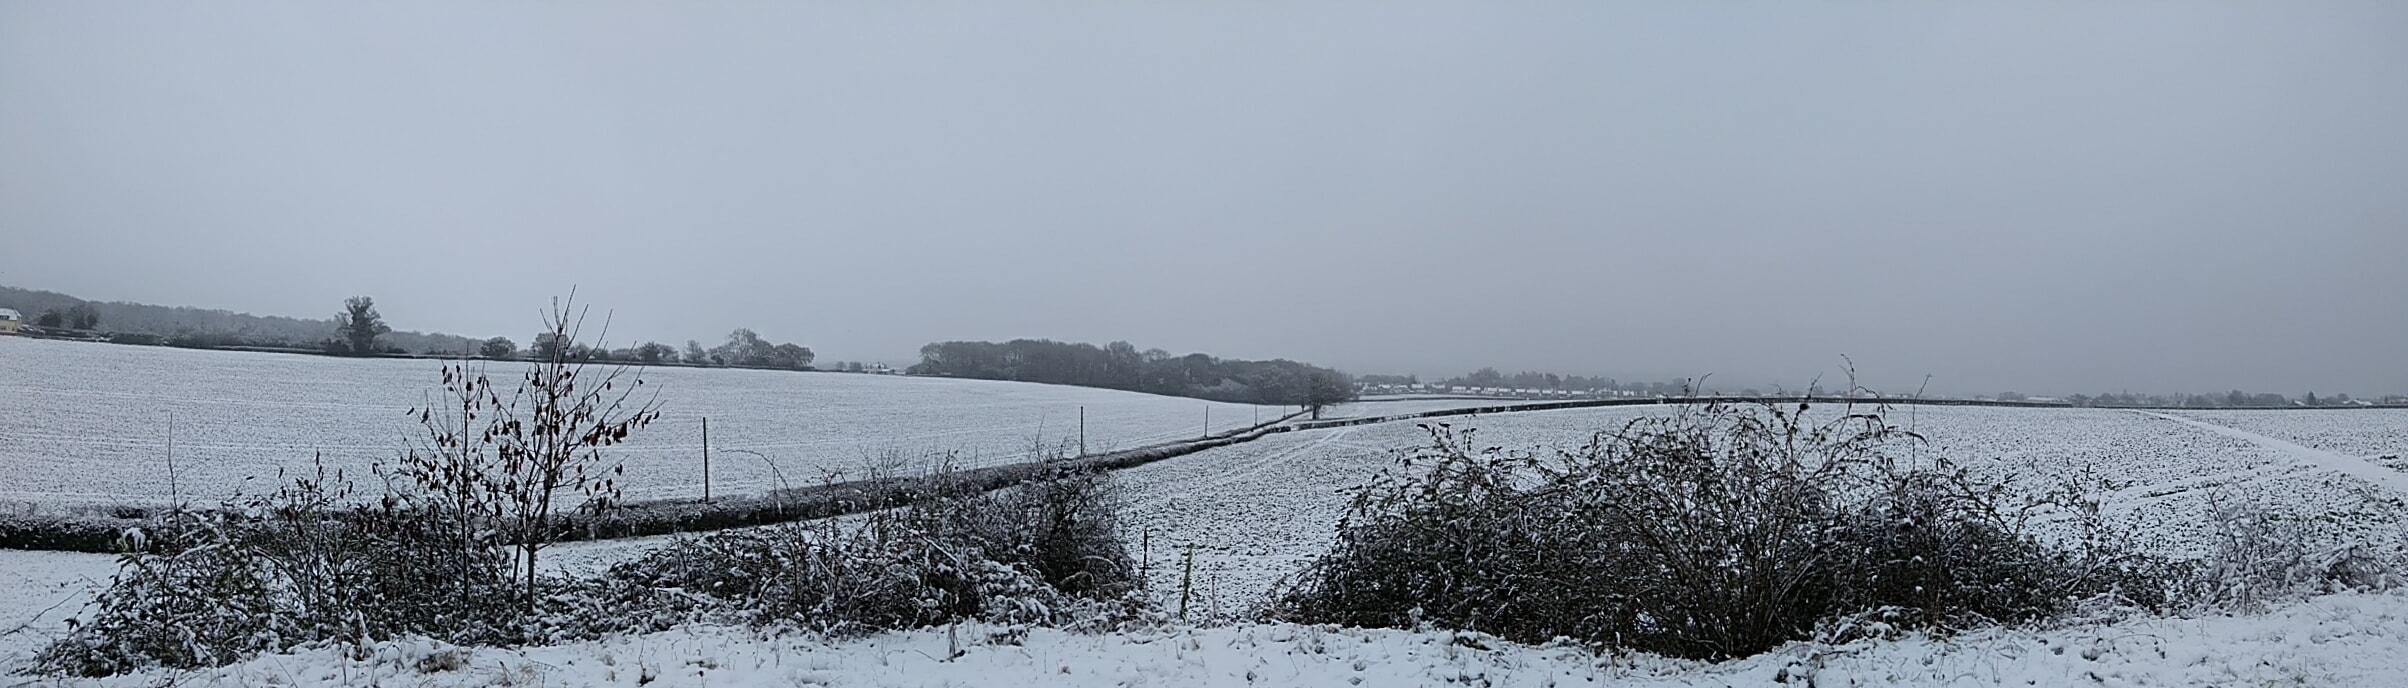 Snowy day in Pinkneys Green